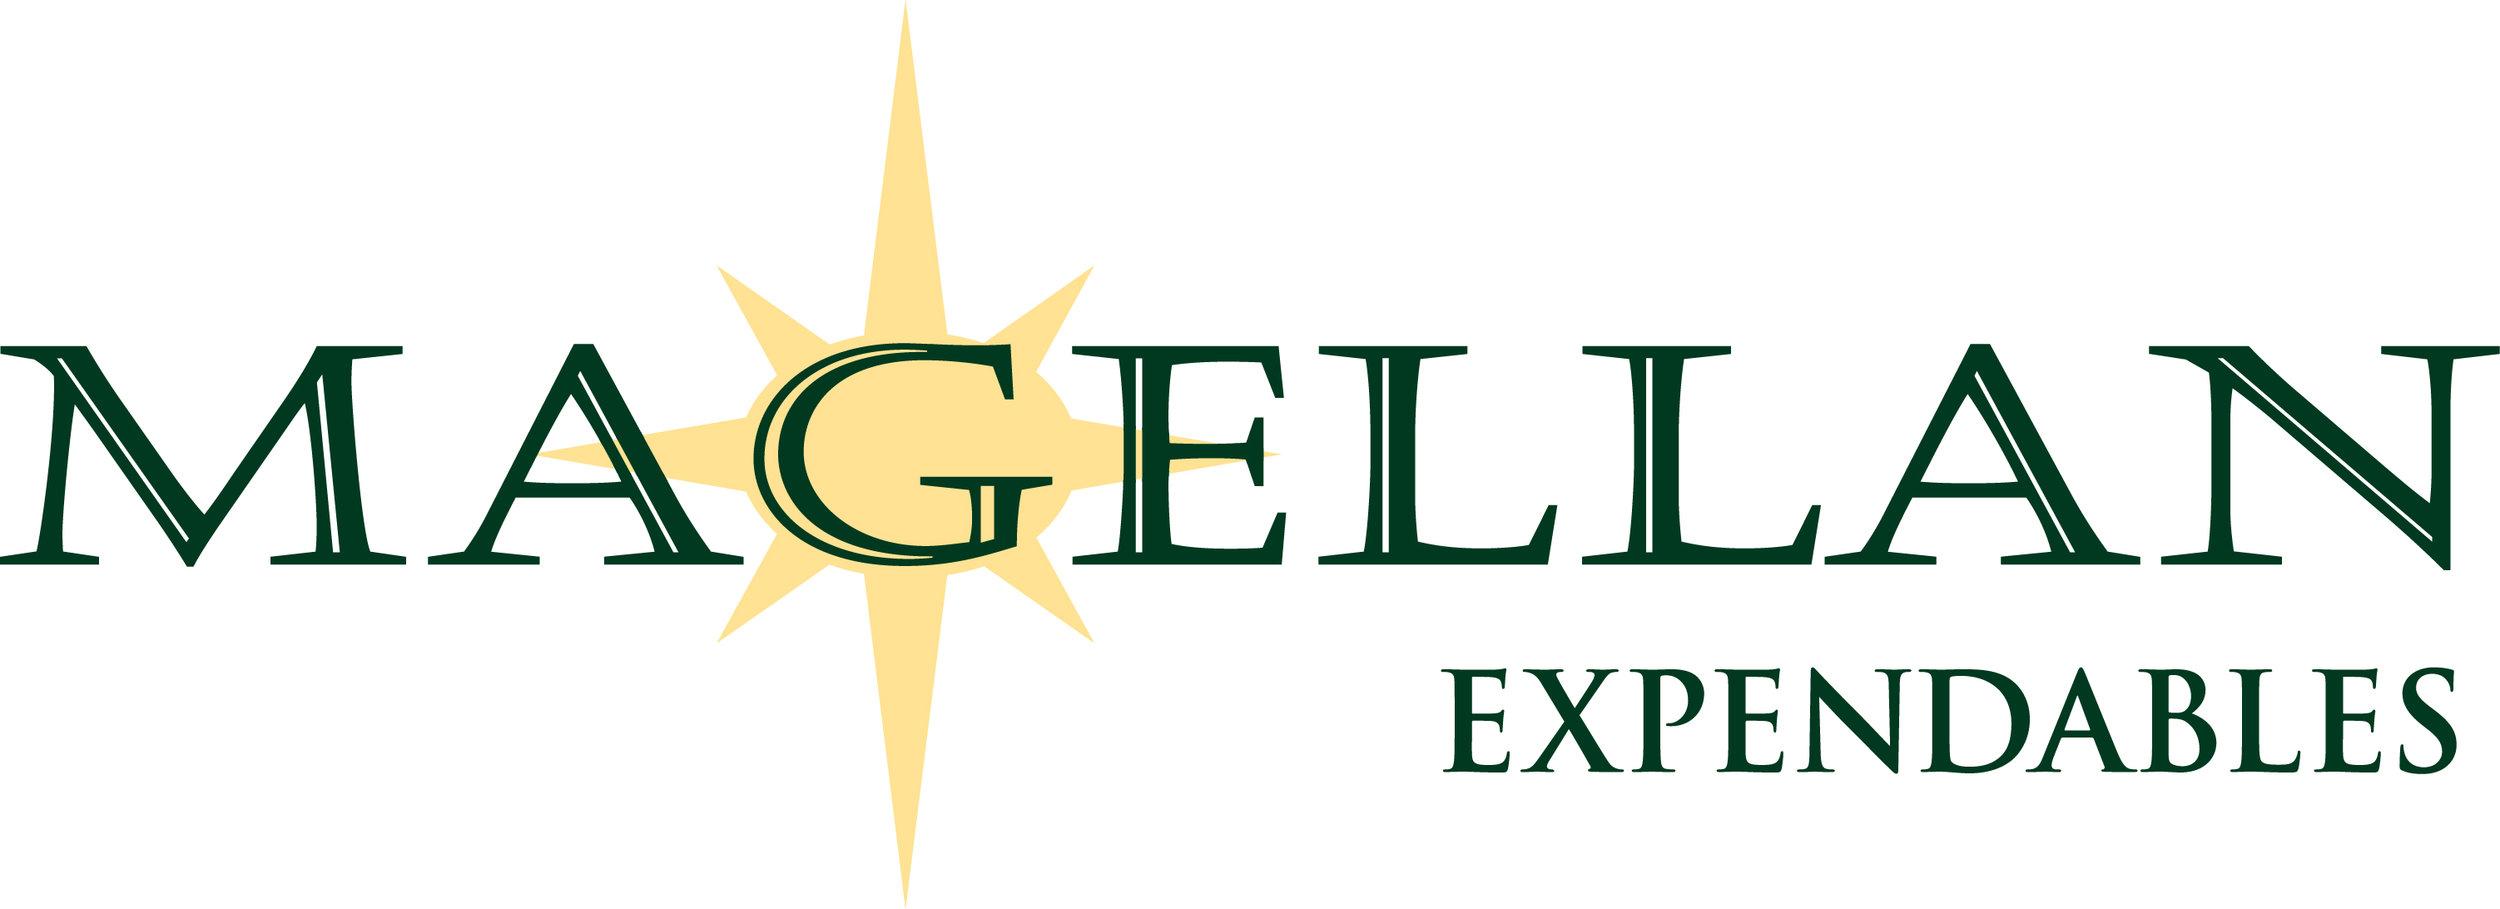 Mag_Expendables_logo_rgb.jpg